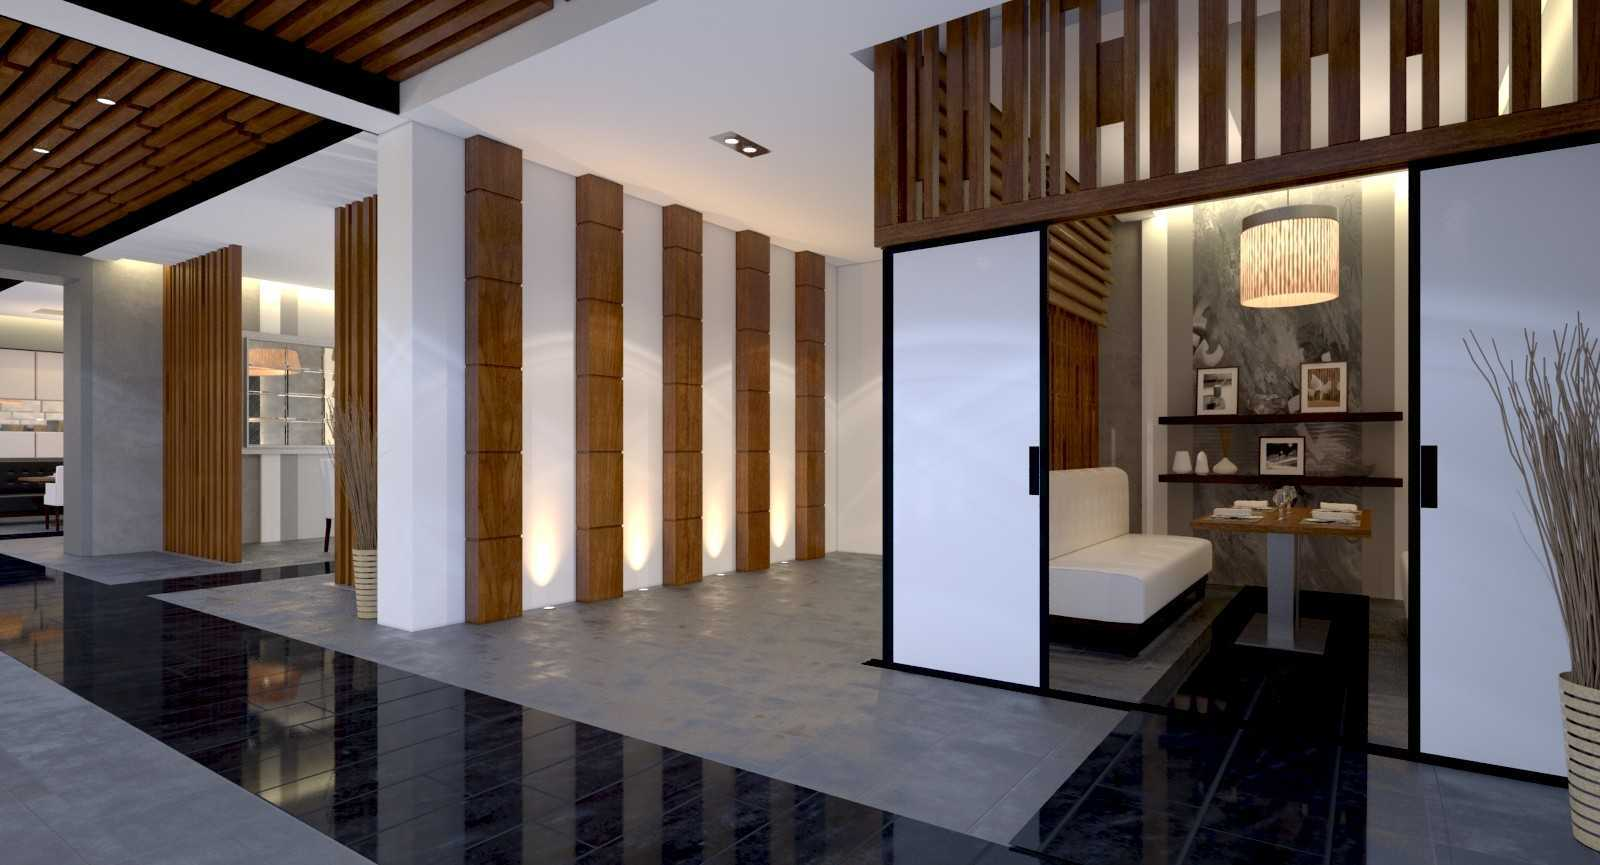 Jr Design Chef Langdon Kuningan, Jakarta Kuningan, Jakarta Corridor Contemporary,modern  17414